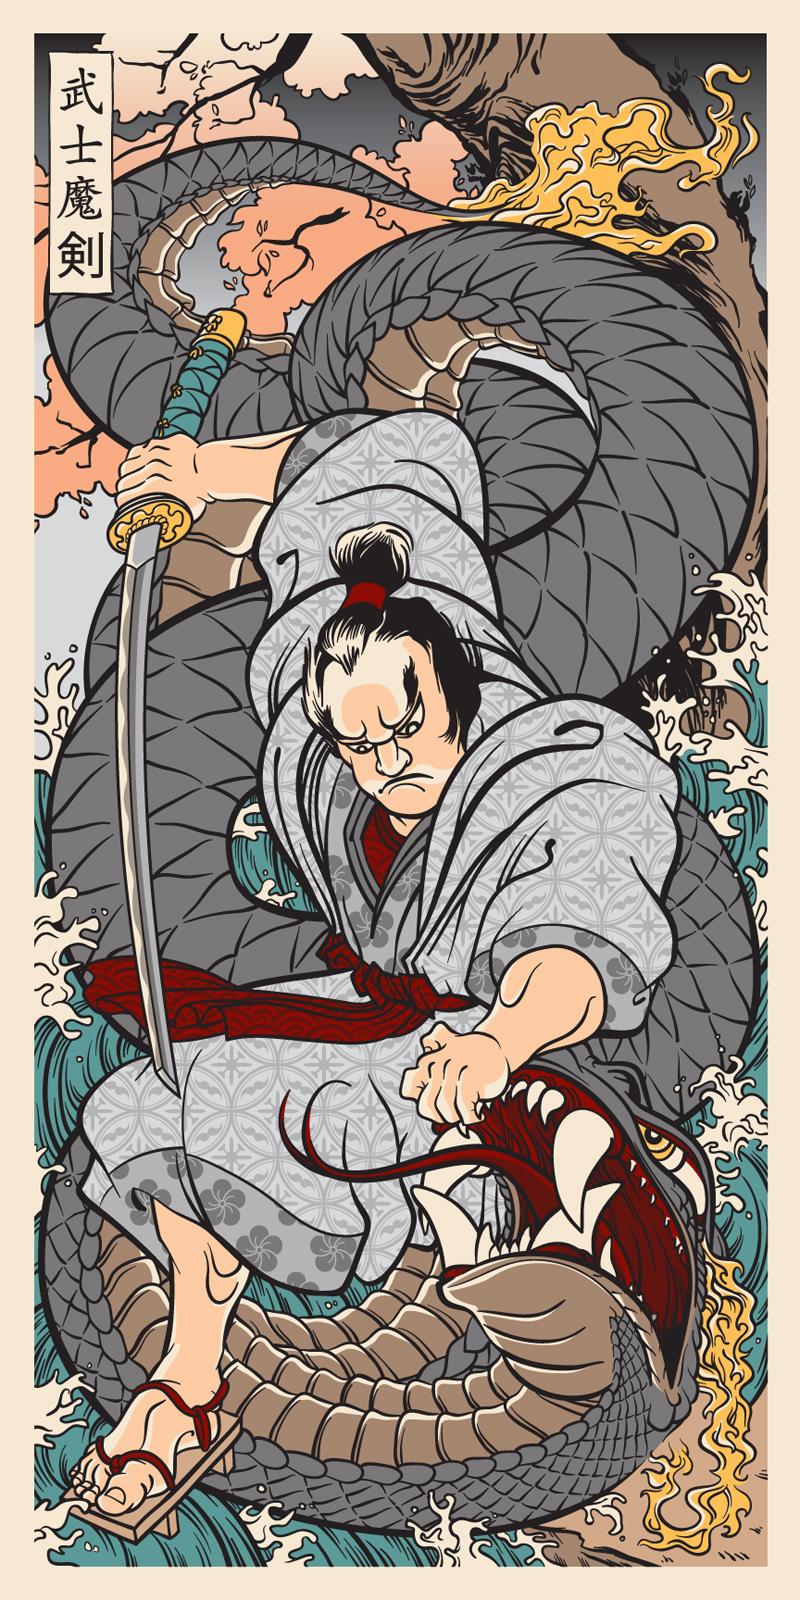 JoshuaBudich_SamuraiPREVIEW.jpg